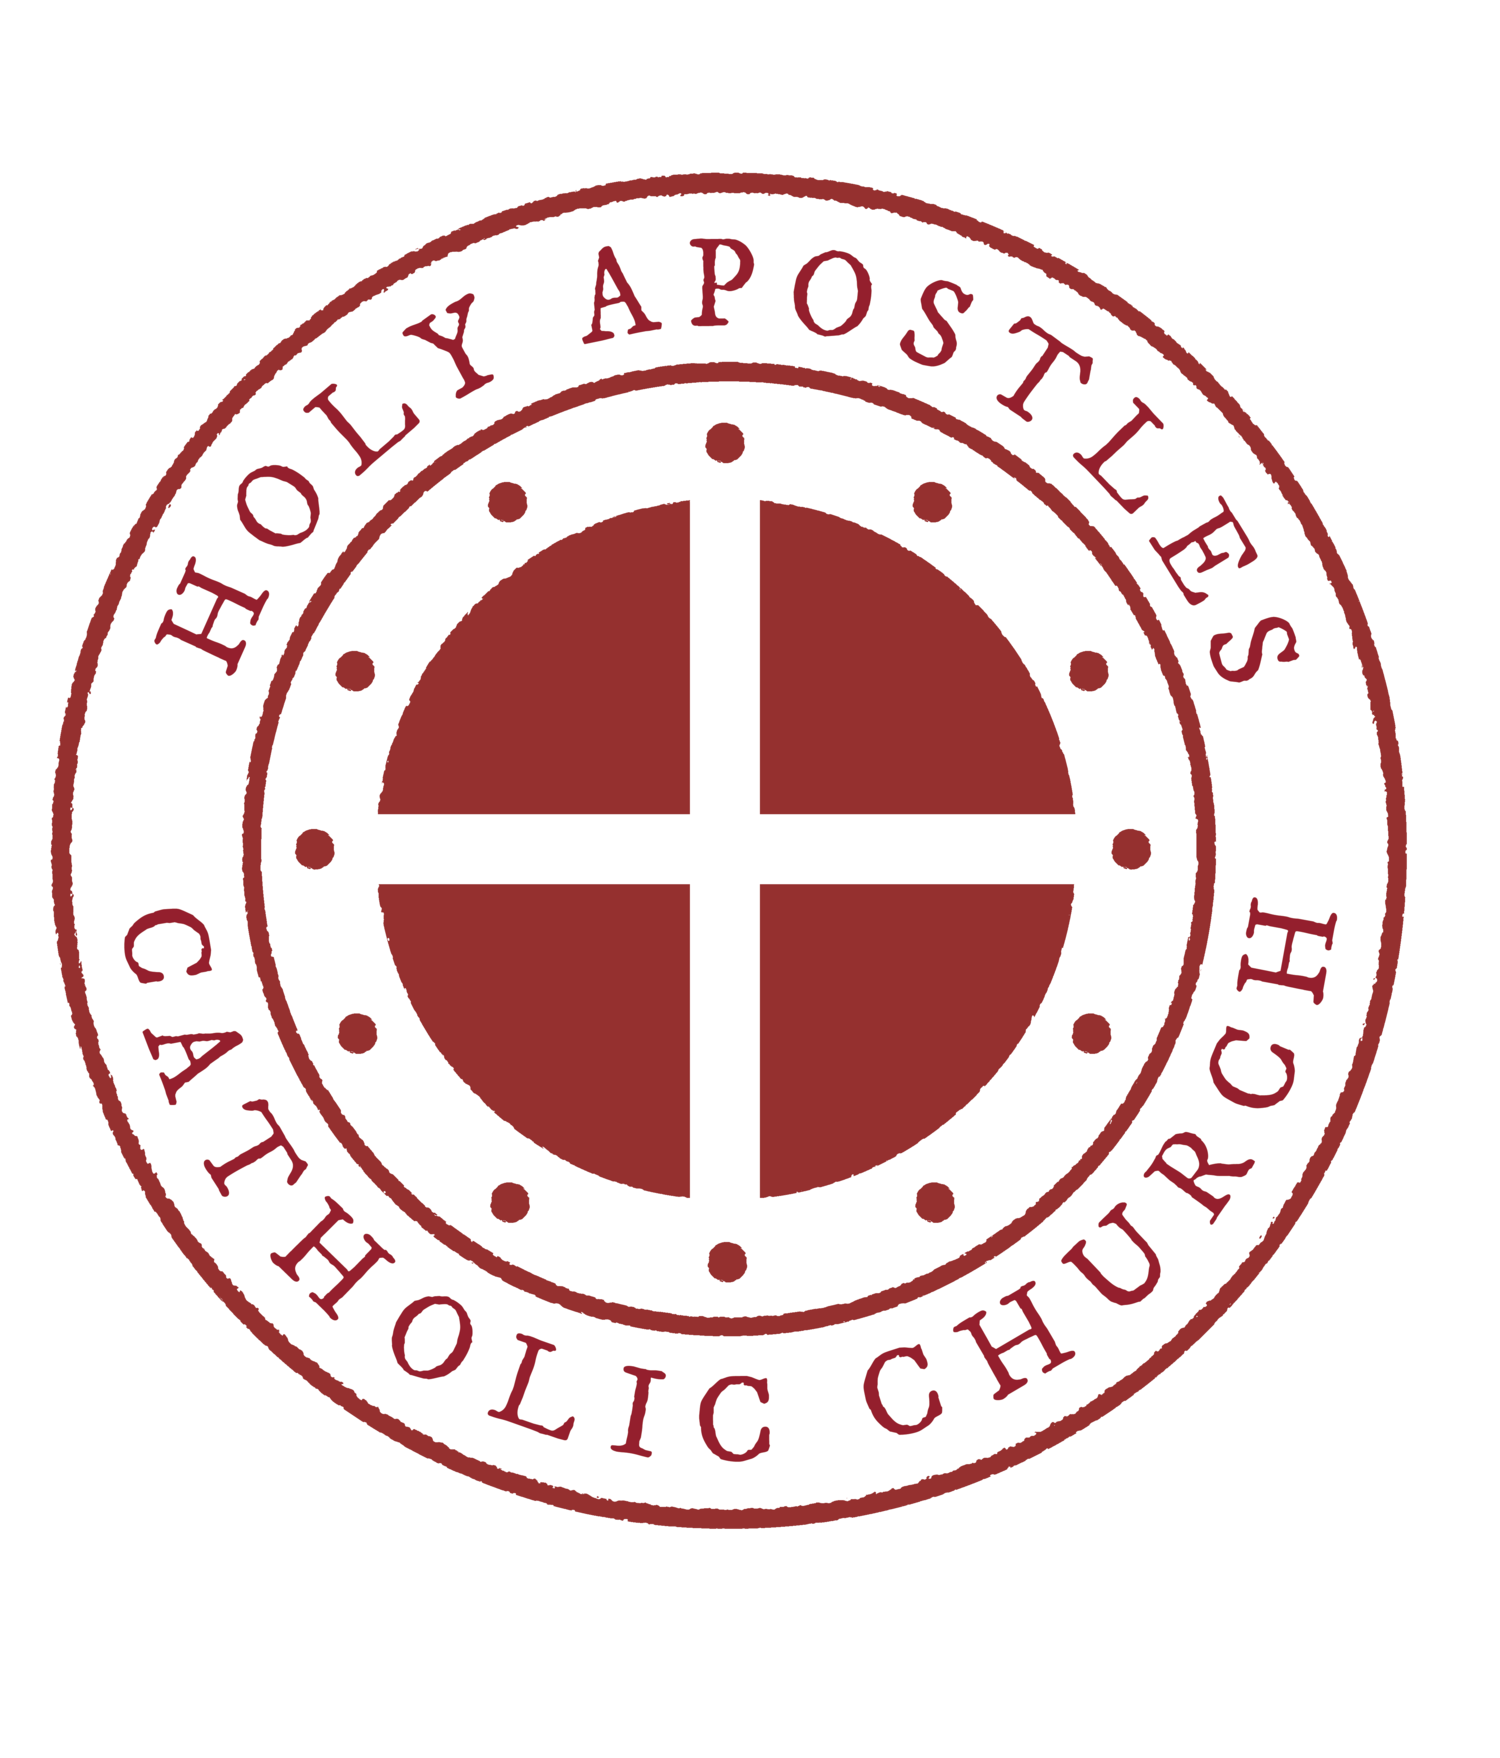 Holy Apostles Catholic Church Preschool